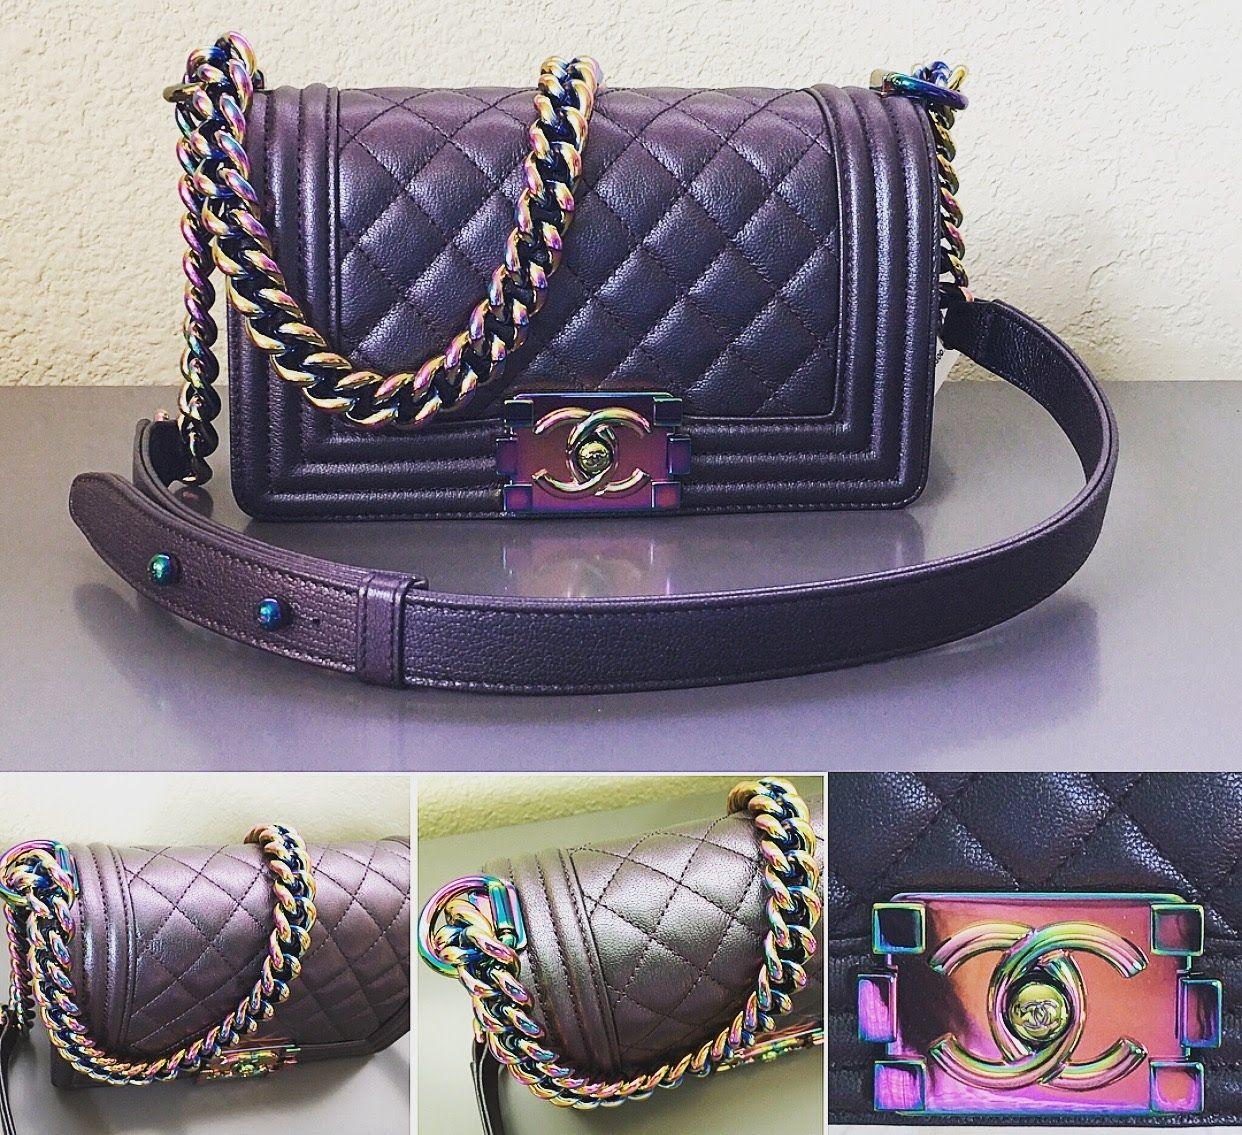 Chanel Handväskor : Chanel iridescent boy bag replica google search